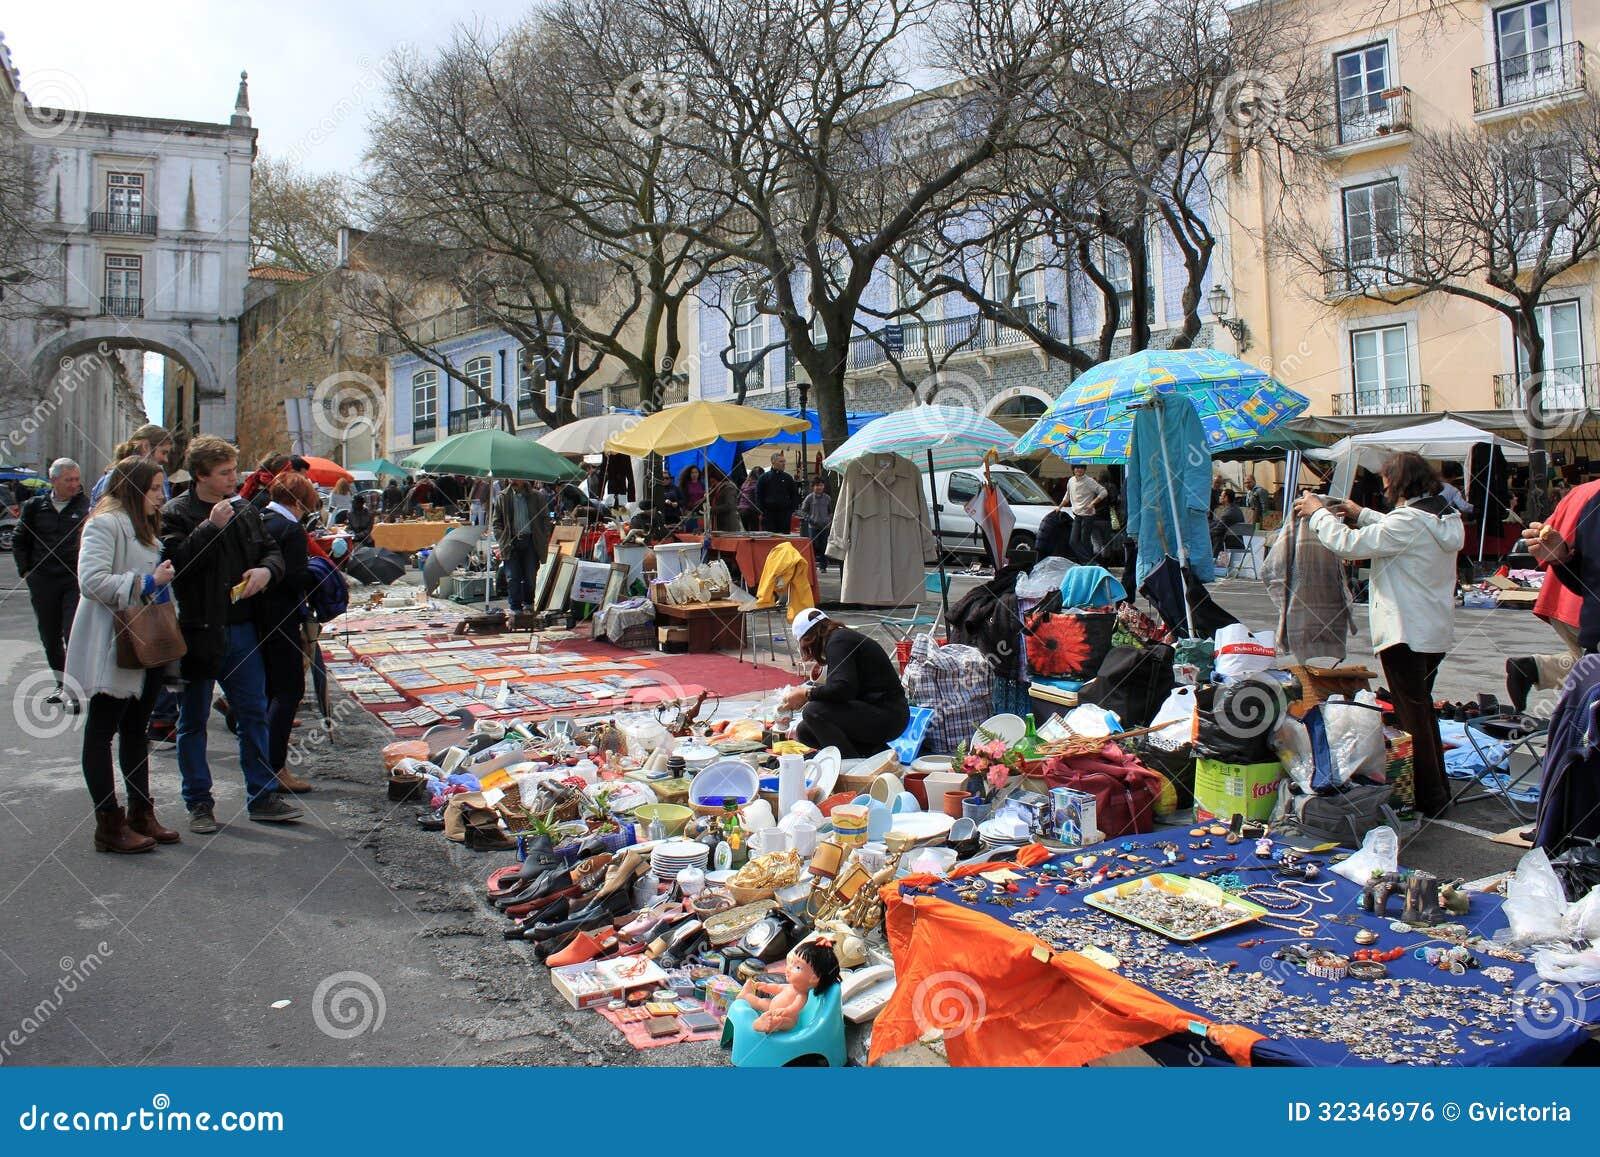 PORTUGAL APRIL6,2013: Feira da ladra, a flea market held twice weekly ...